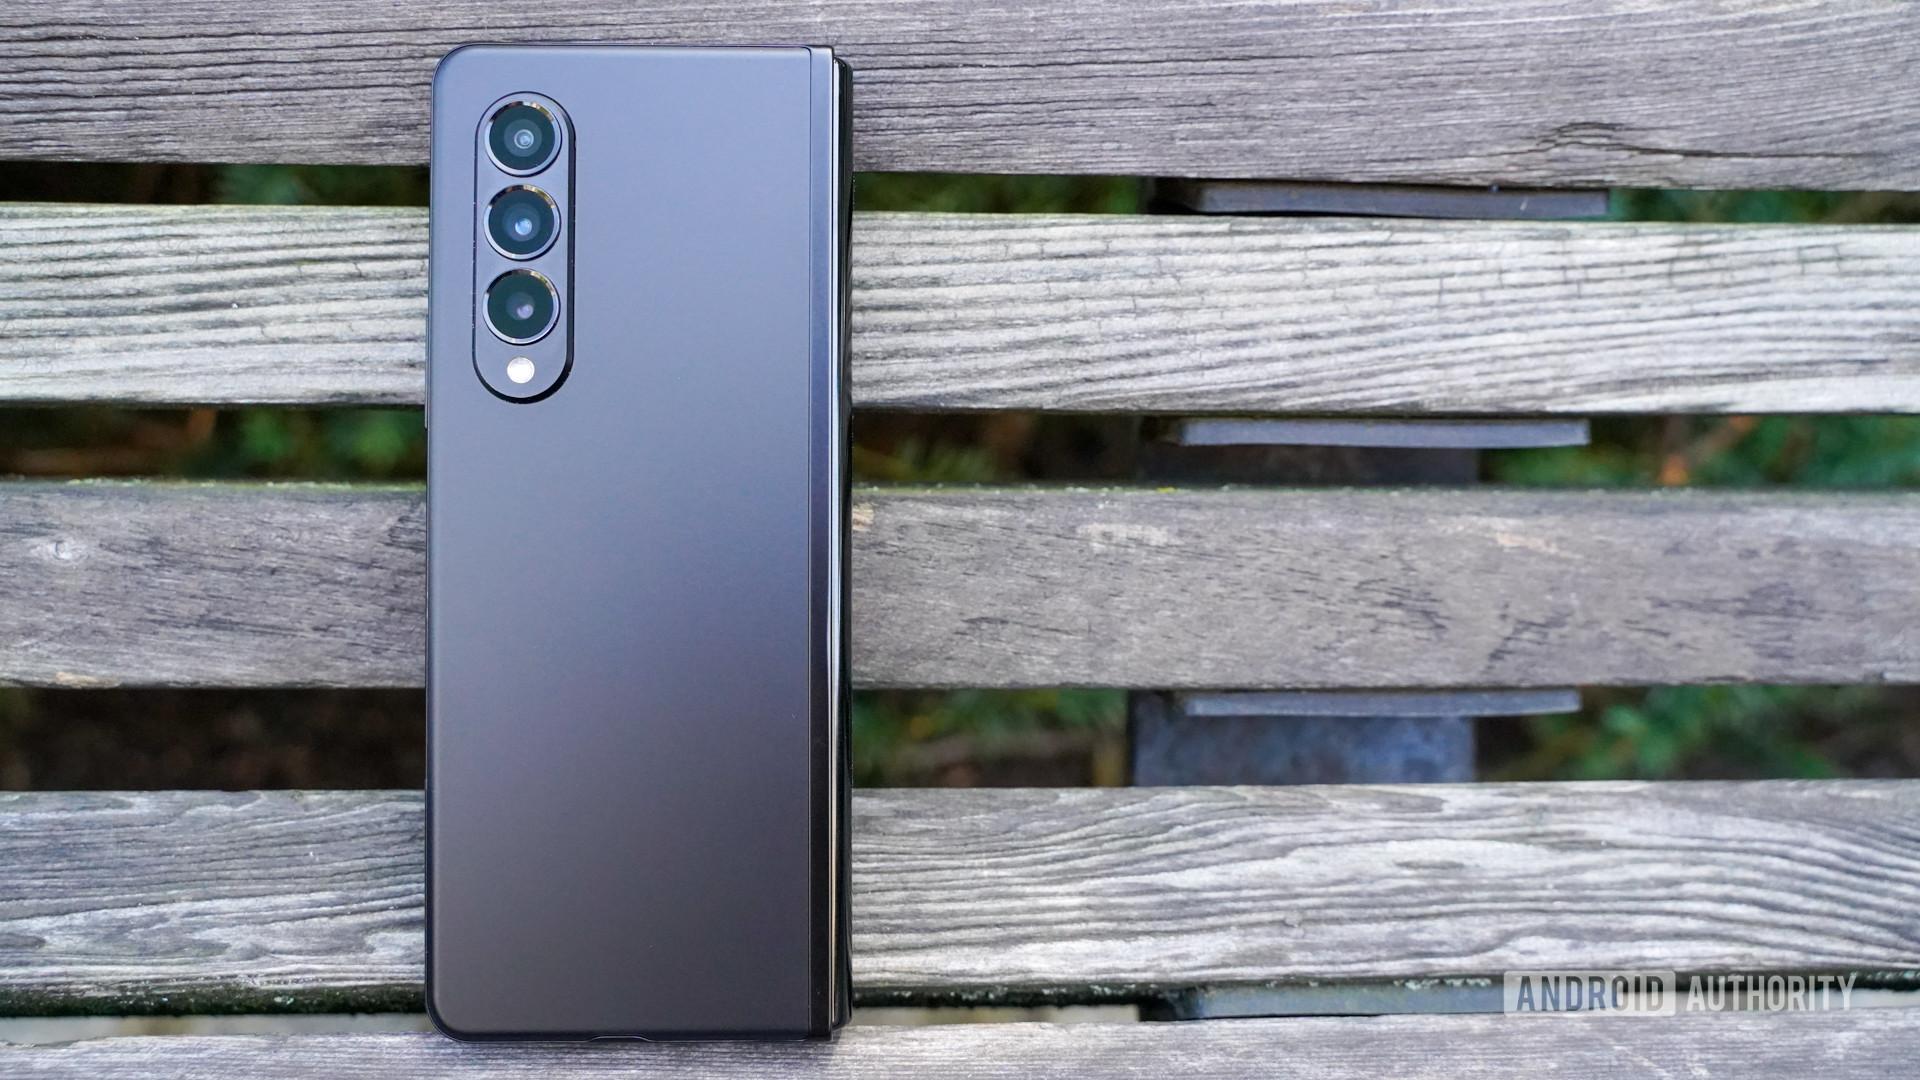 Samsung Galaxy Z Fold 3 camera rear on a bench.